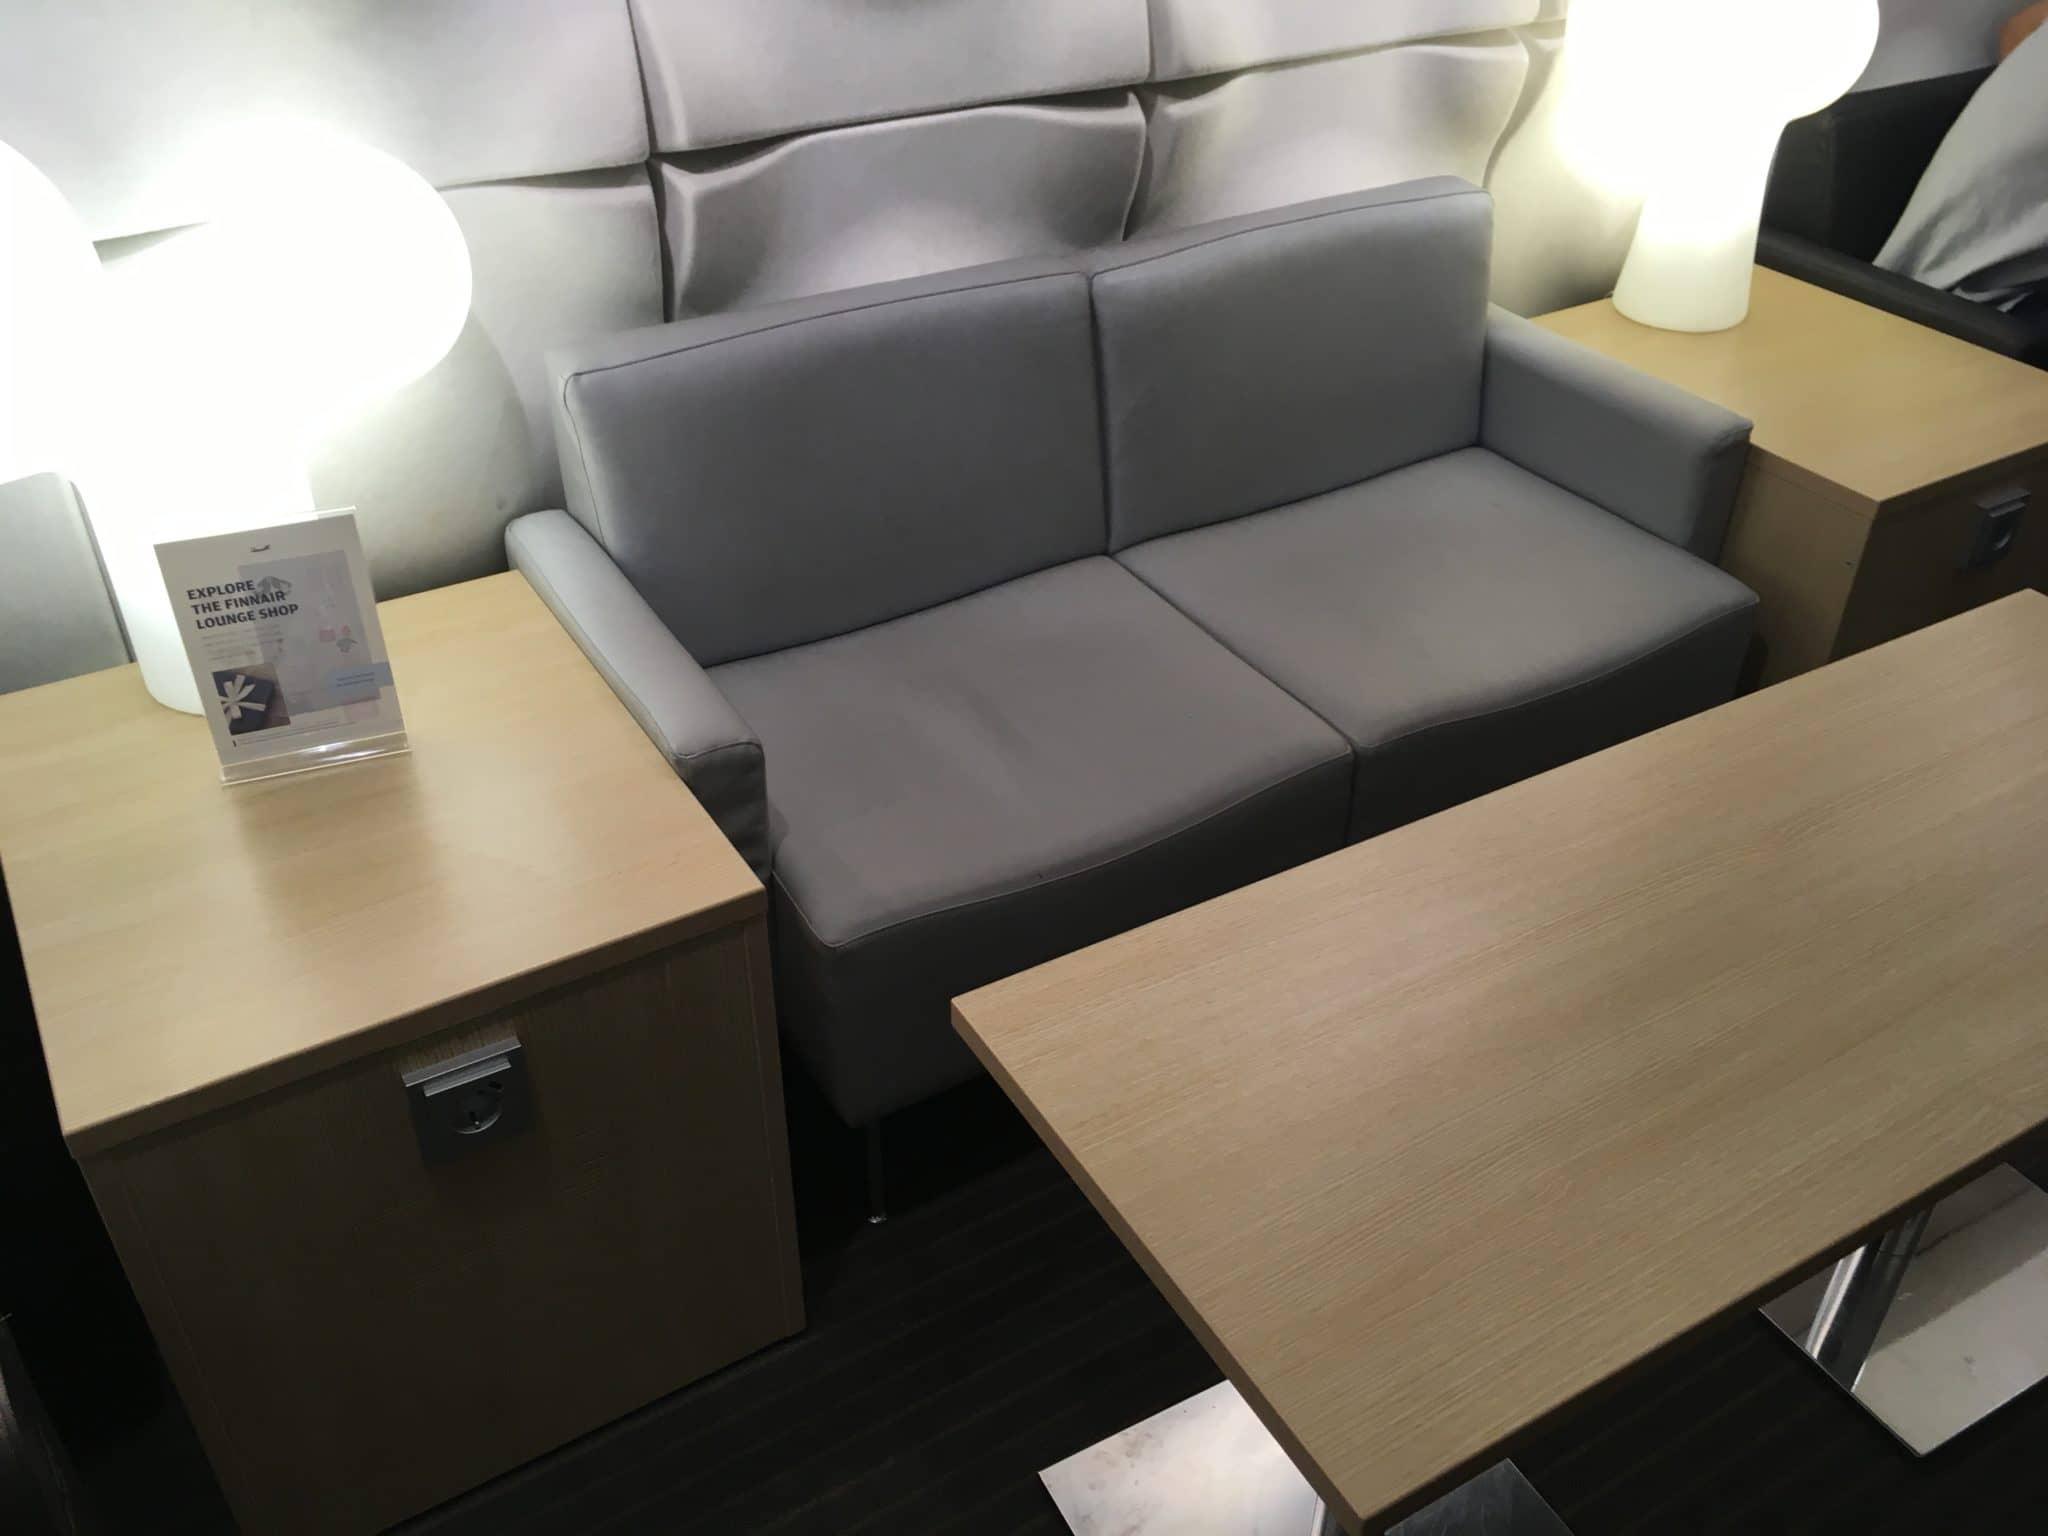 Finnair Lounge Helsinki Non-Schengen Steckdose Couch